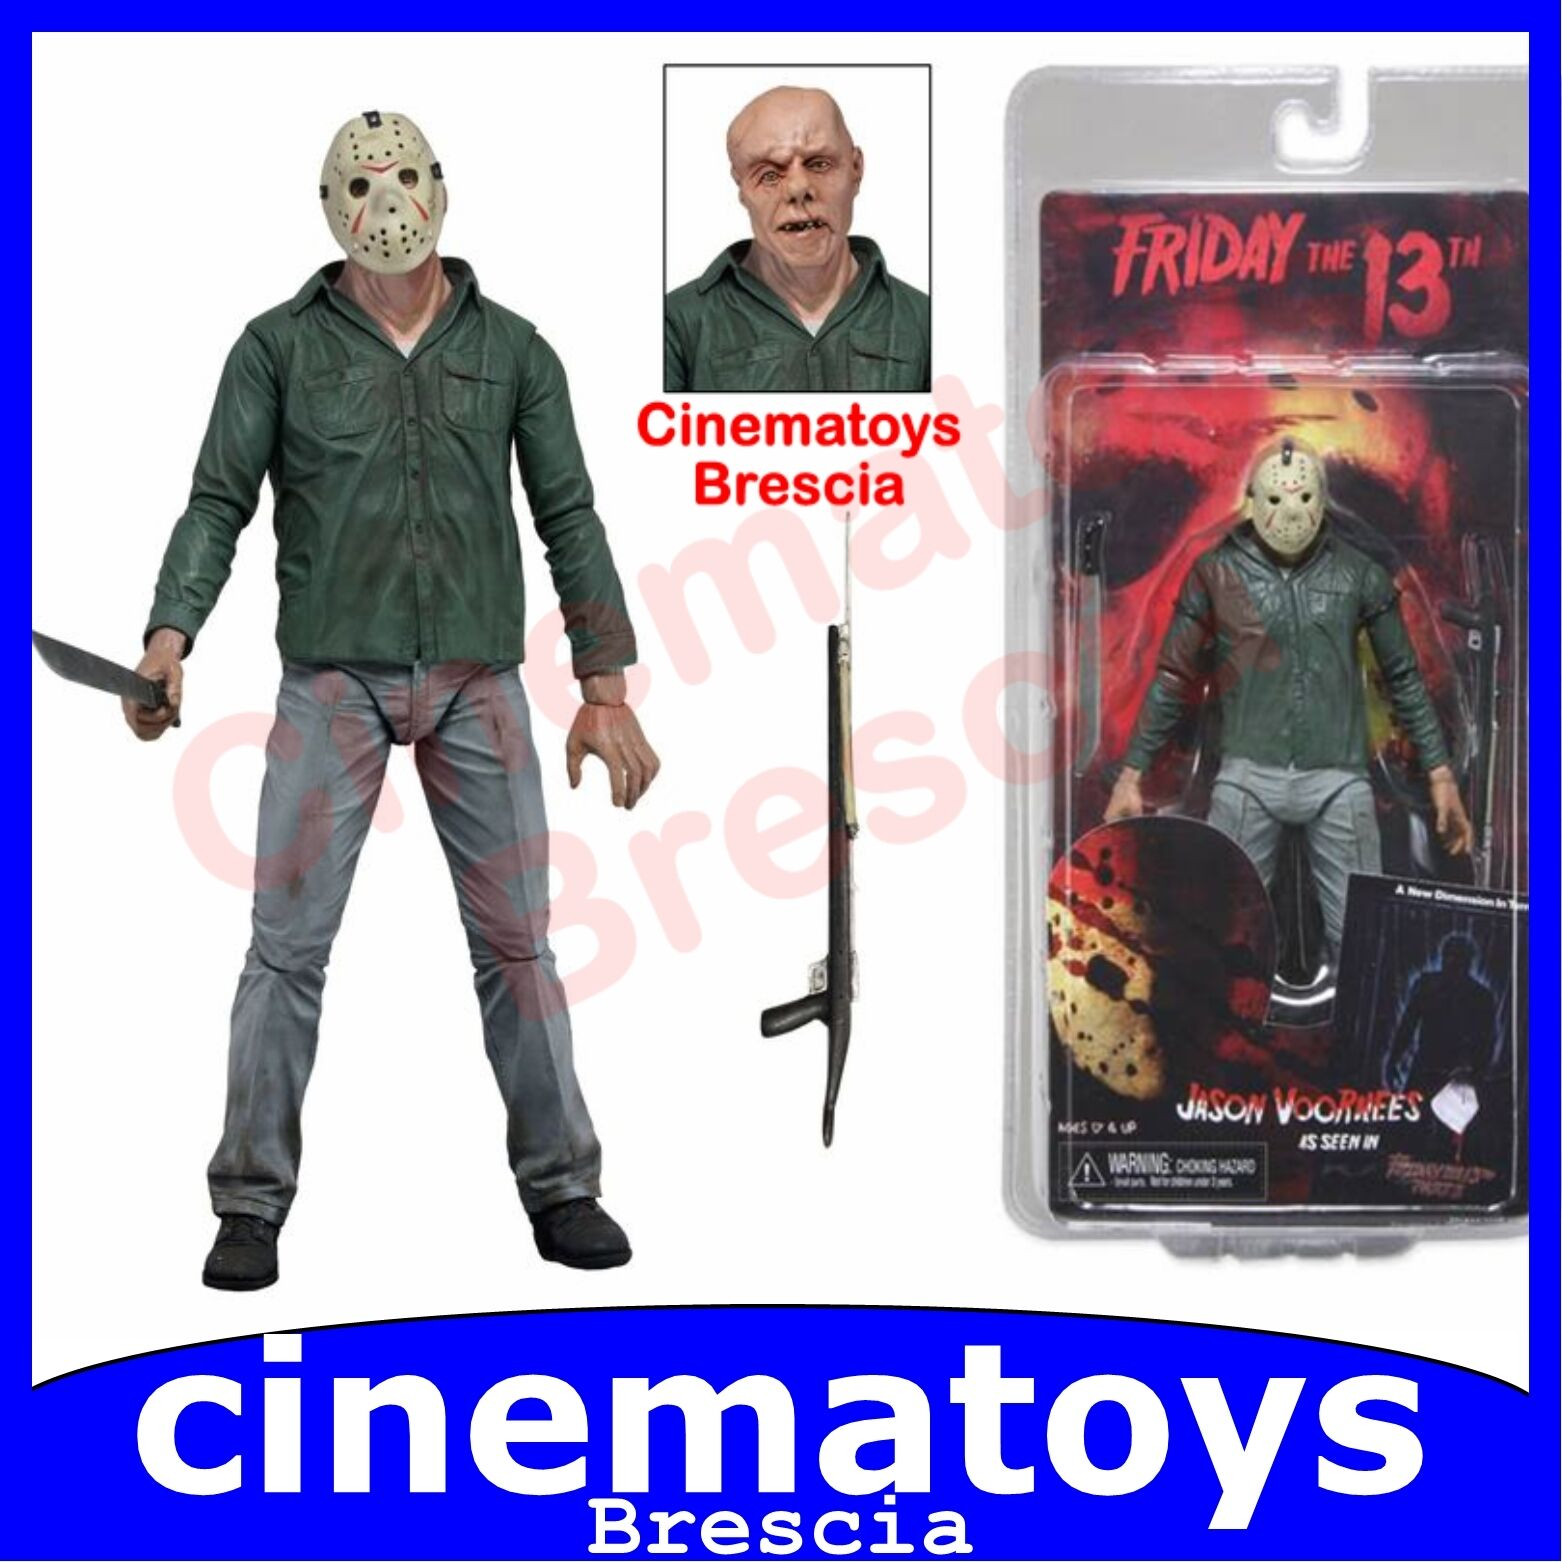 Definitive Jason Voorhees Friday the 13th Part III NECA NECA NECA Action Figure RARA 612b57